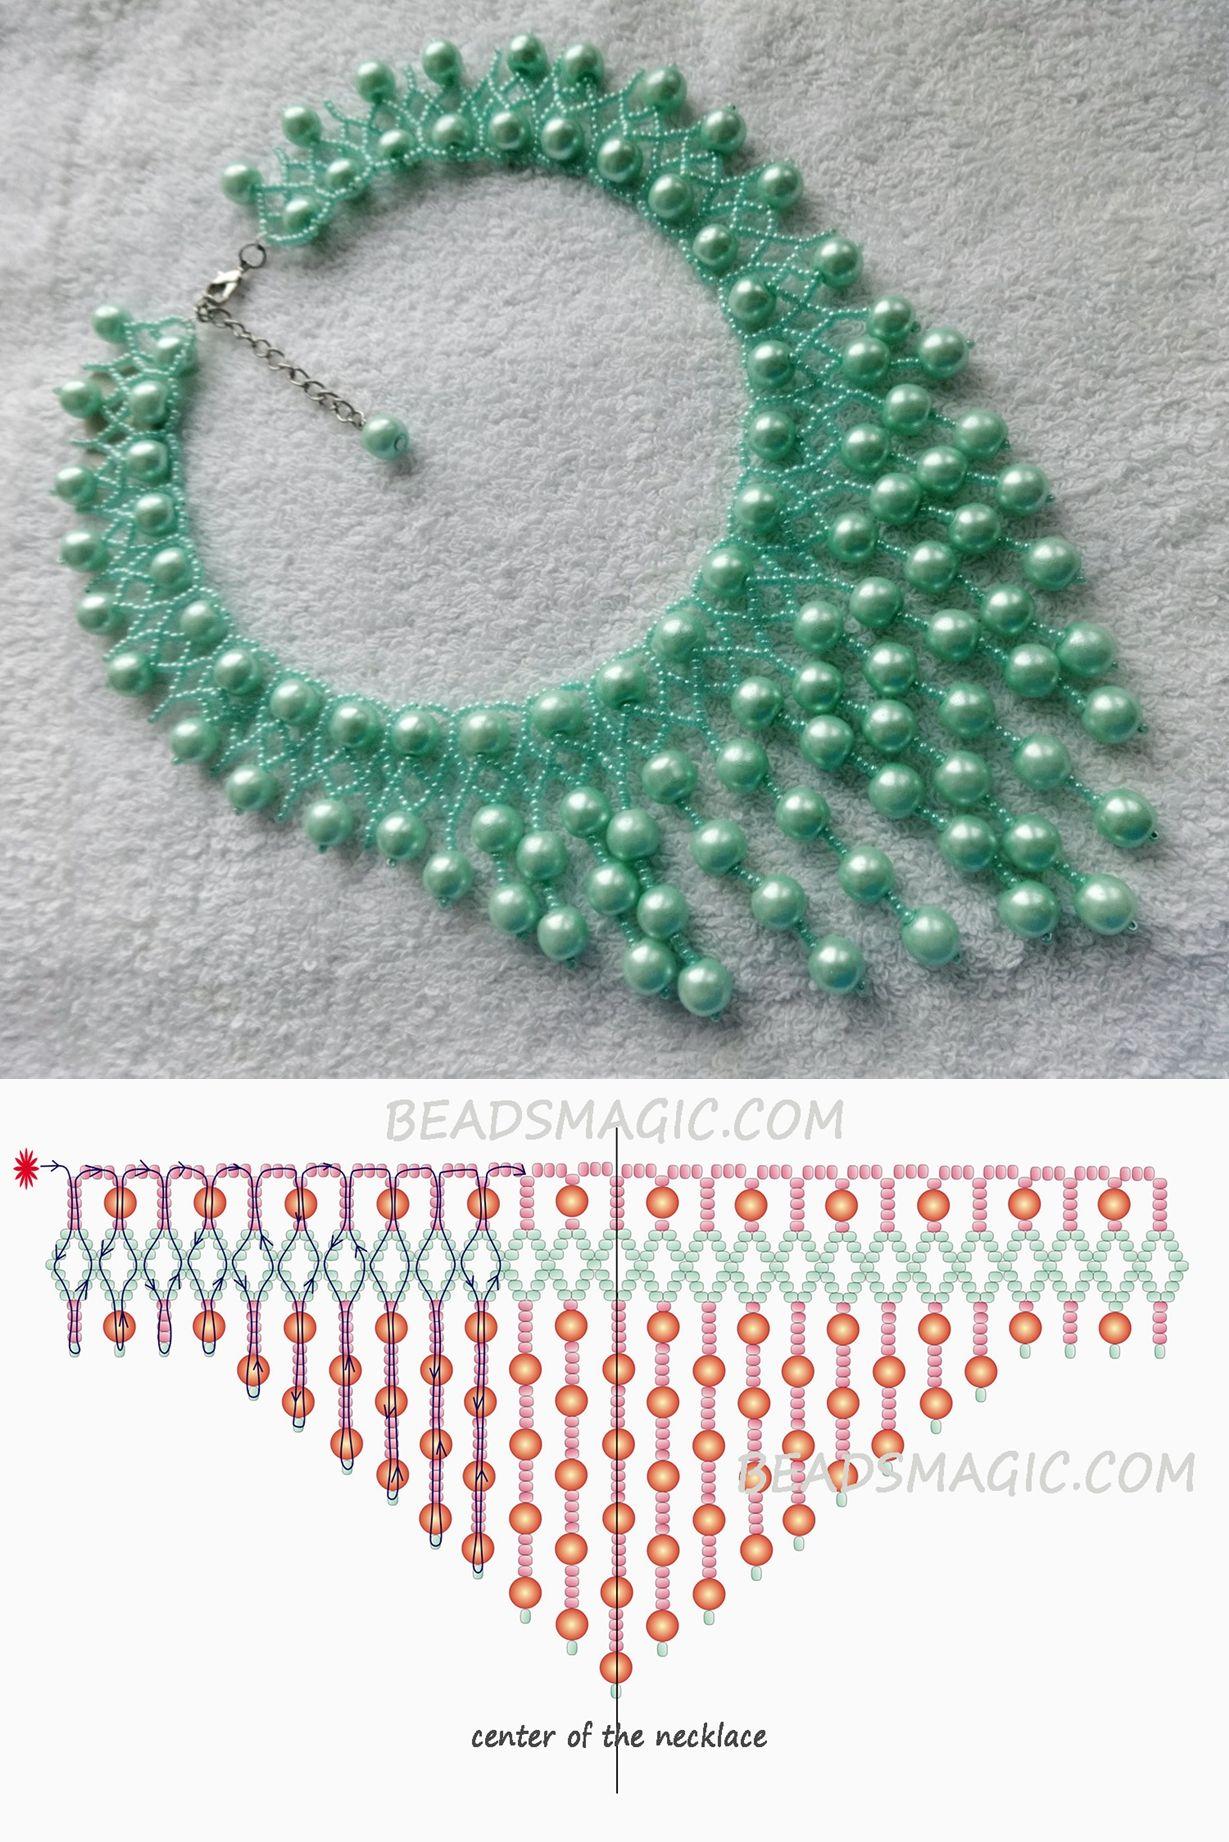 free pattern for necklace fresh mint beading pinterest schmuck perlenkette und diy schmuck. Black Bedroom Furniture Sets. Home Design Ideas